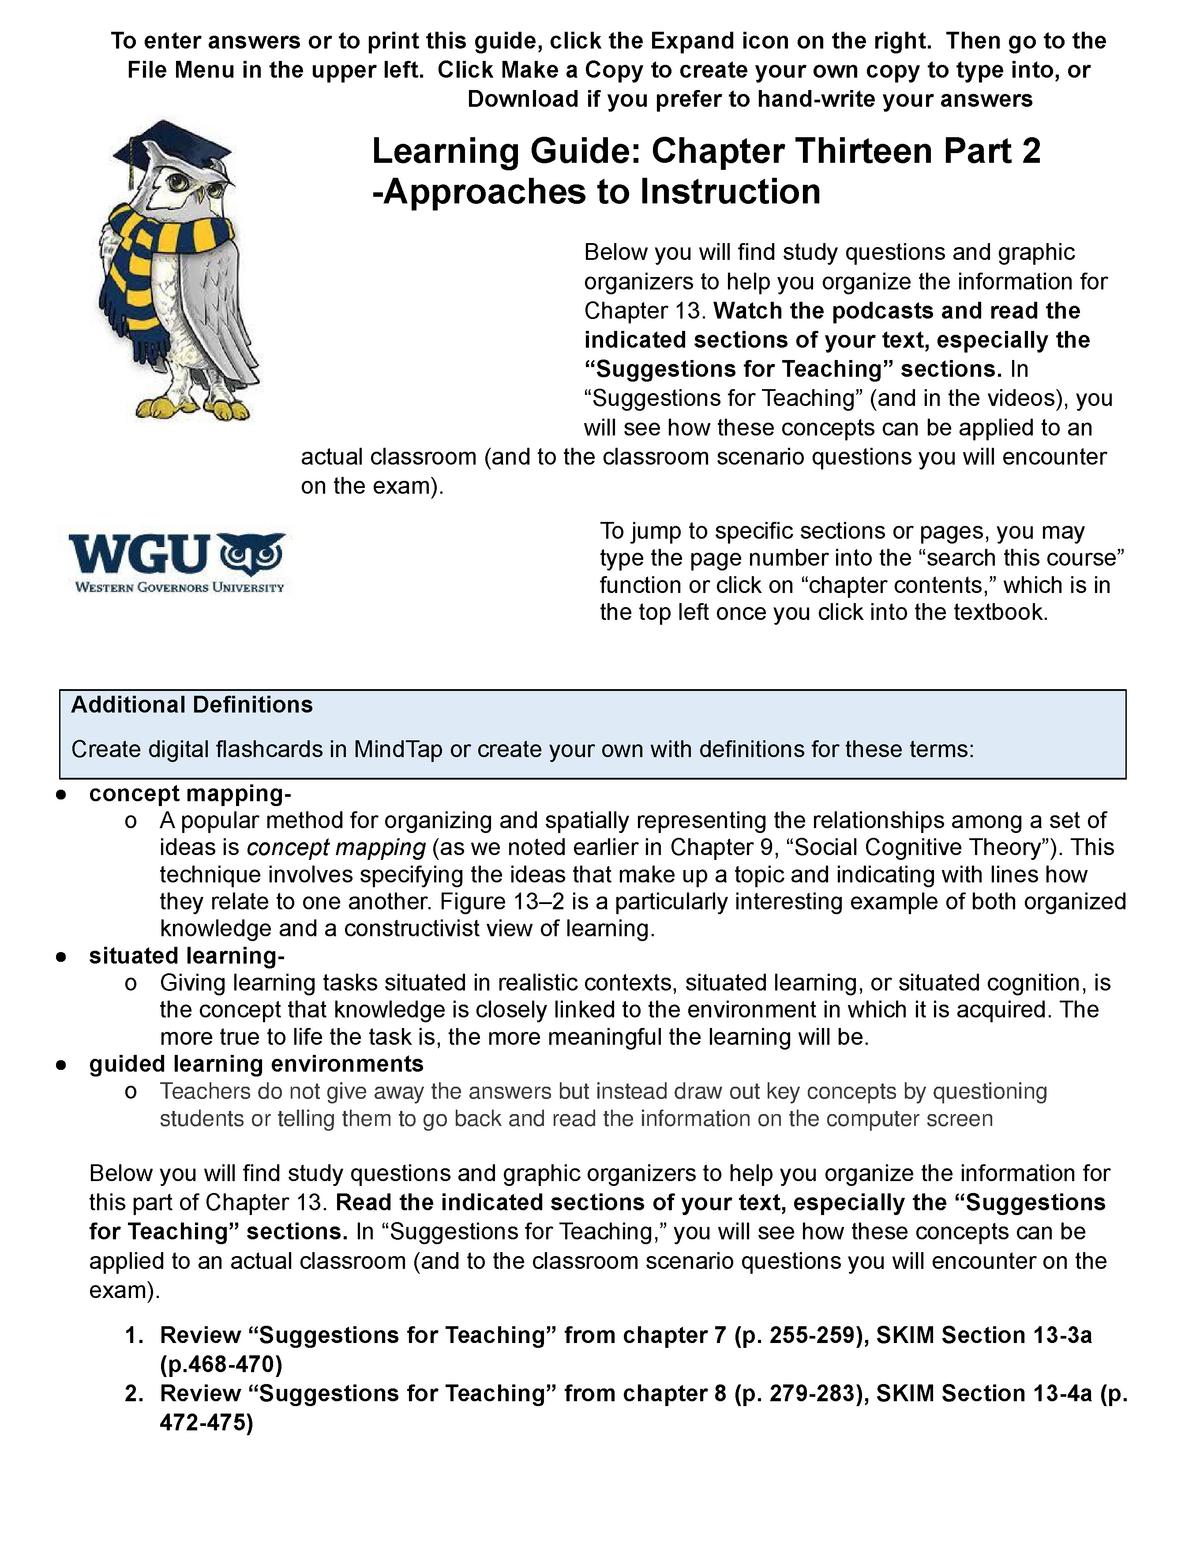 Wgu C913 Chapter 13 Learning Guide Part 2 Studocu [ 1553 x 1200 Pixel ]